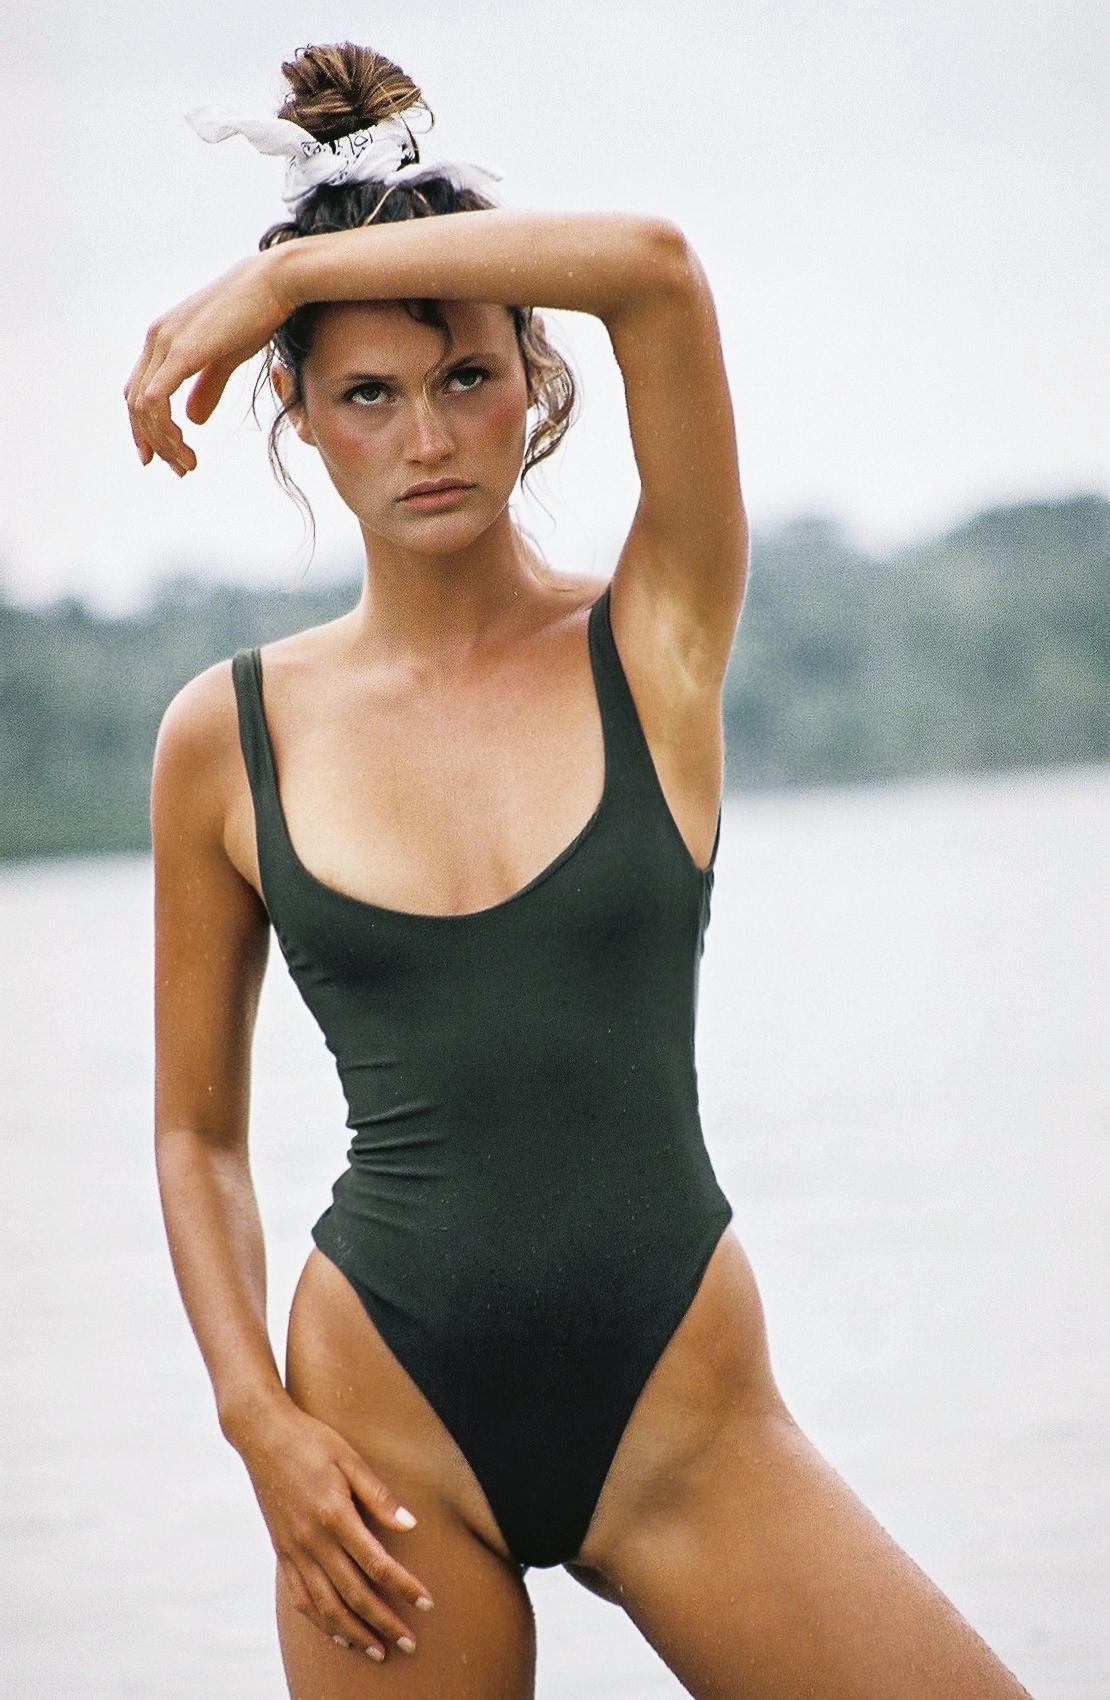 Swimsuit Tanya Girardi nudes (88 photo) Boobs, Snapchat, butt